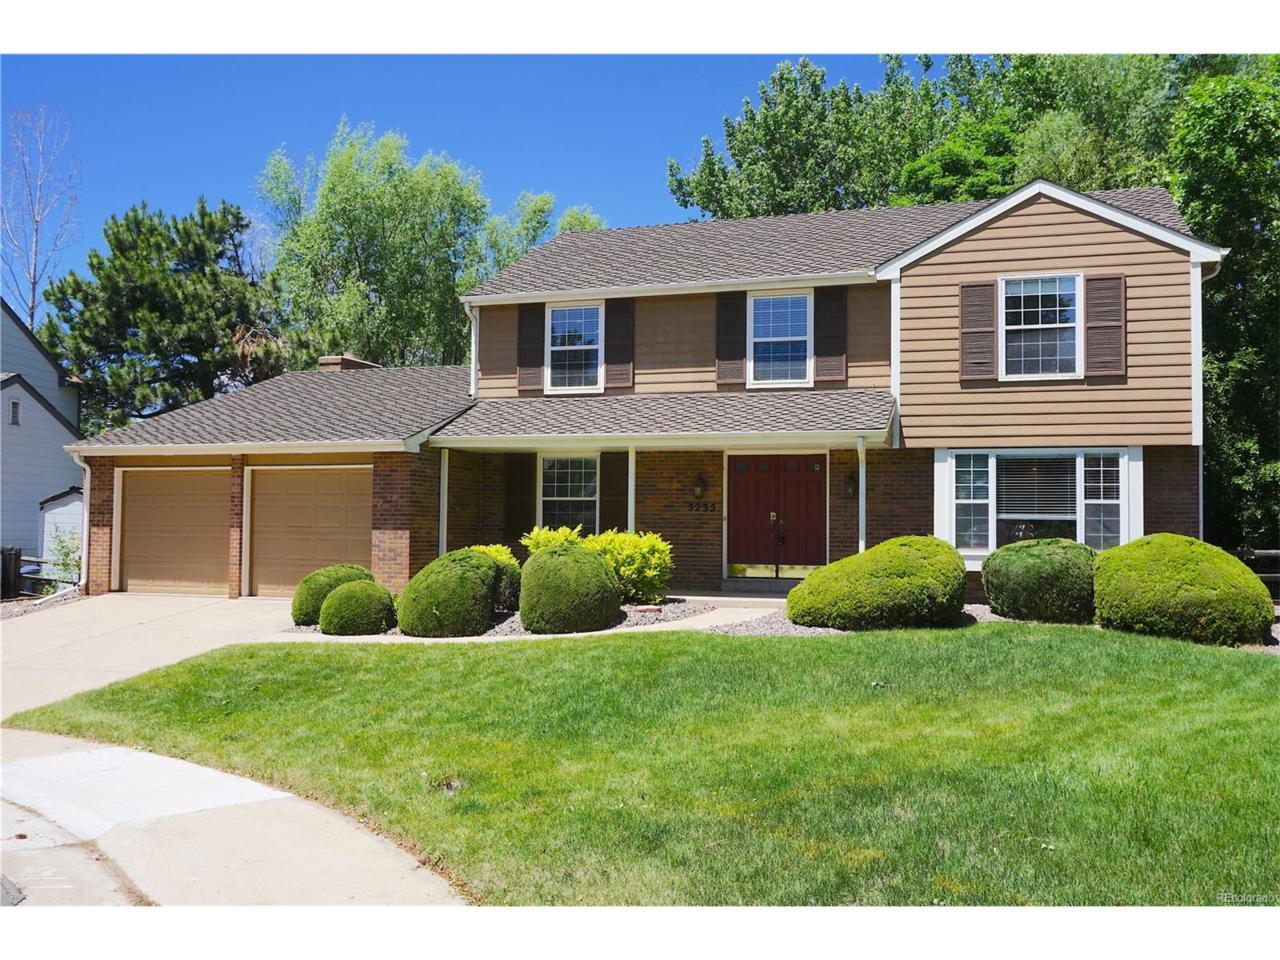 5235 S Hoyt Street, Littleton, CO 80123 (MLS #2901509) :: 8z Real Estate